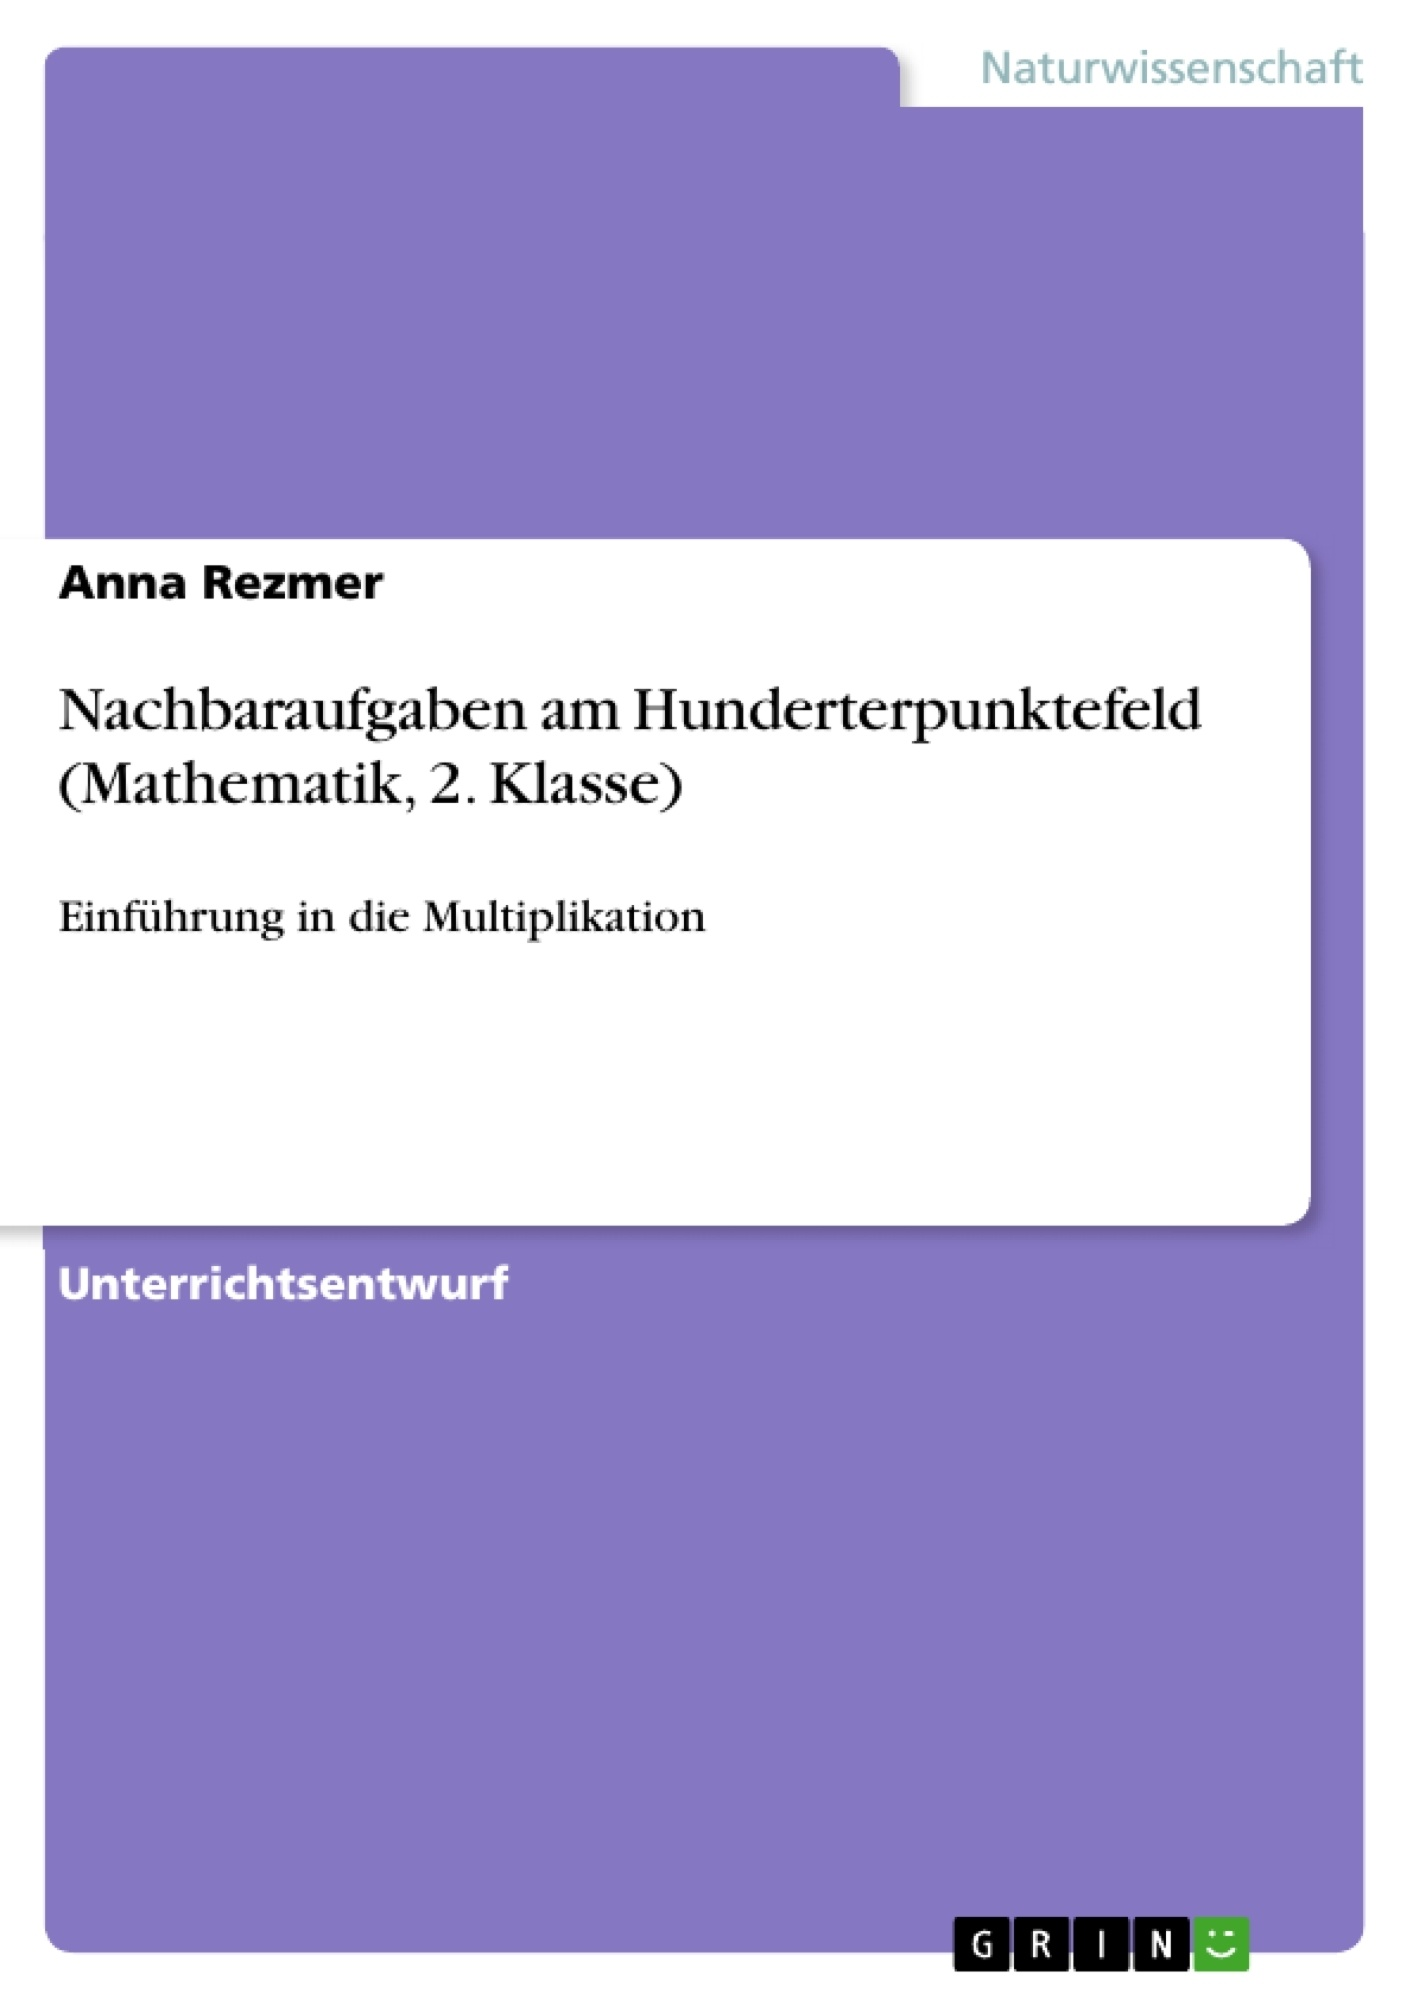 Titel: Nachbaraufgaben am Hunderterpunktefeld (Mathematik, 2. Klasse)